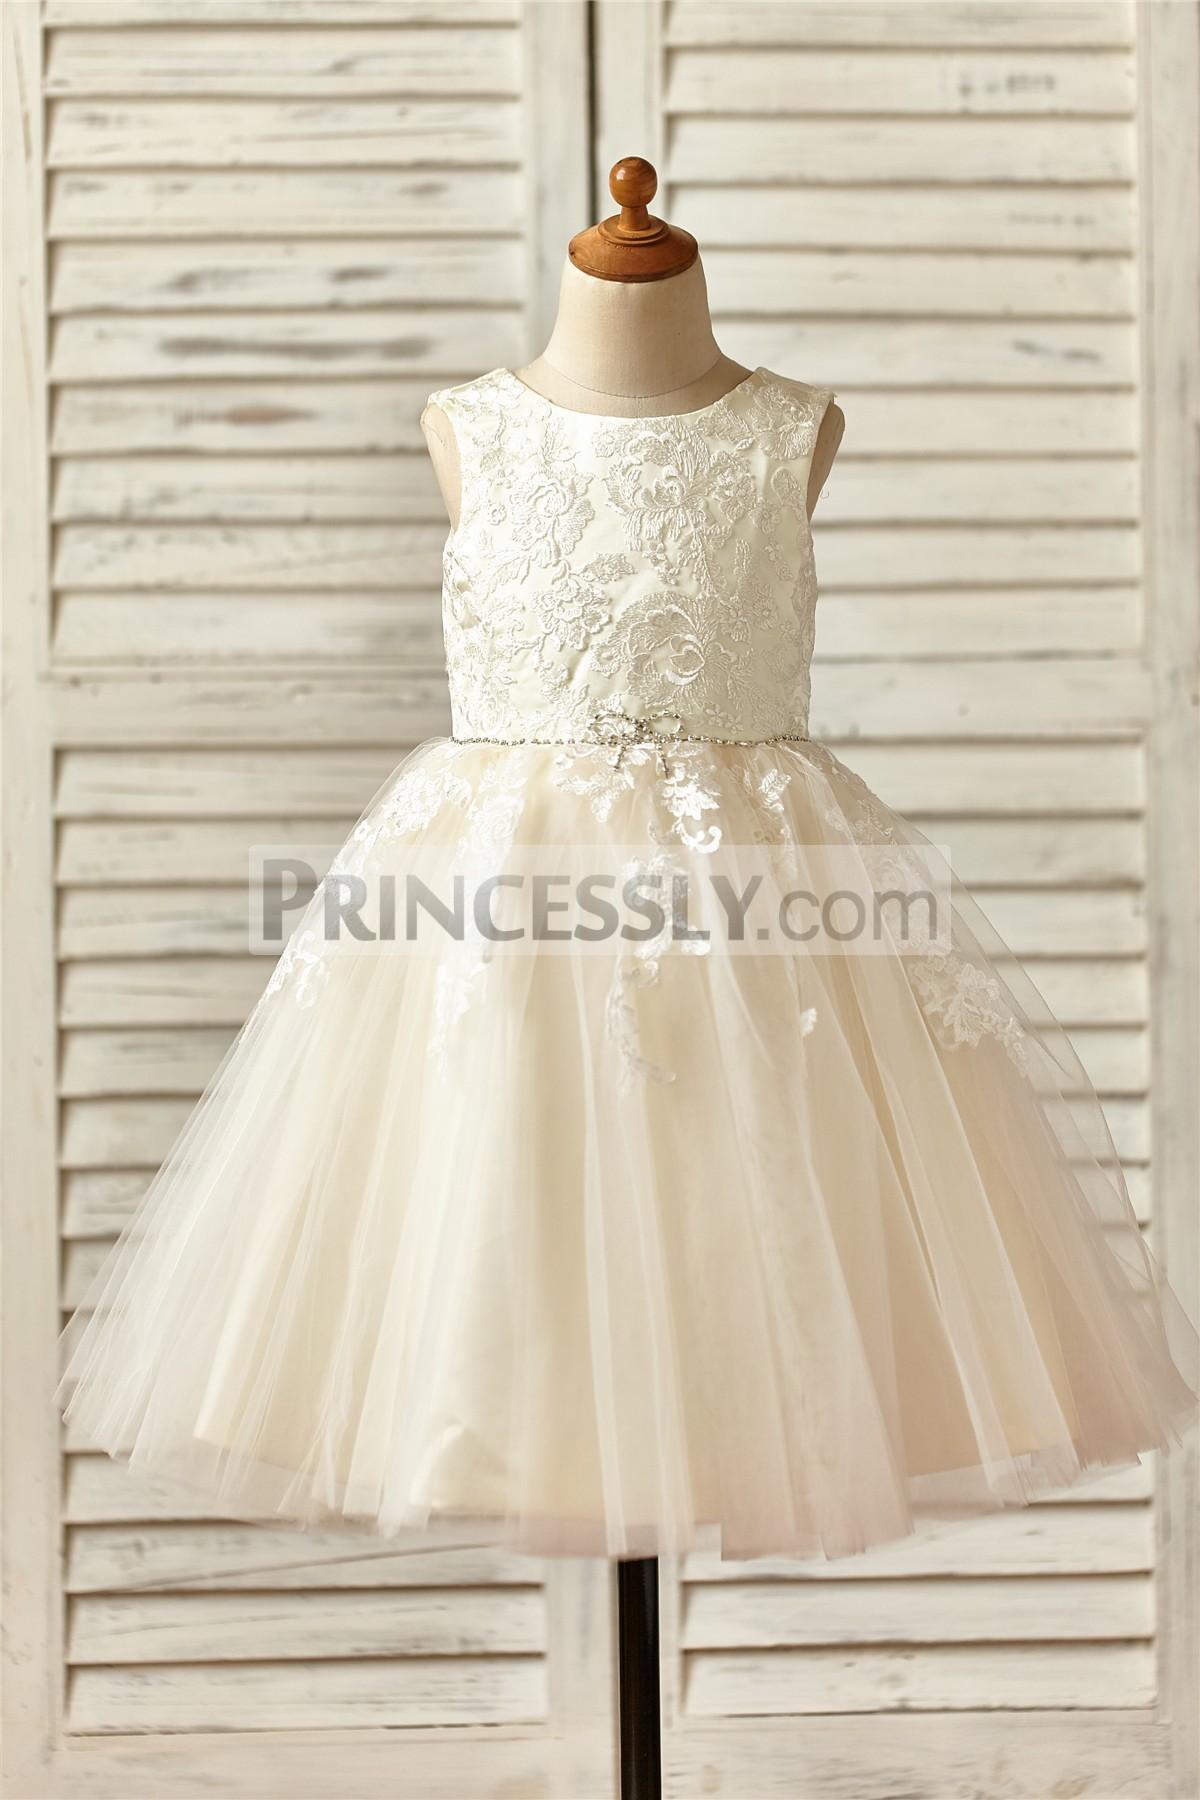 Princessly.com-K1000145 Champagne Satin Tulle Flower Girl Dress with Beaded Sash-31